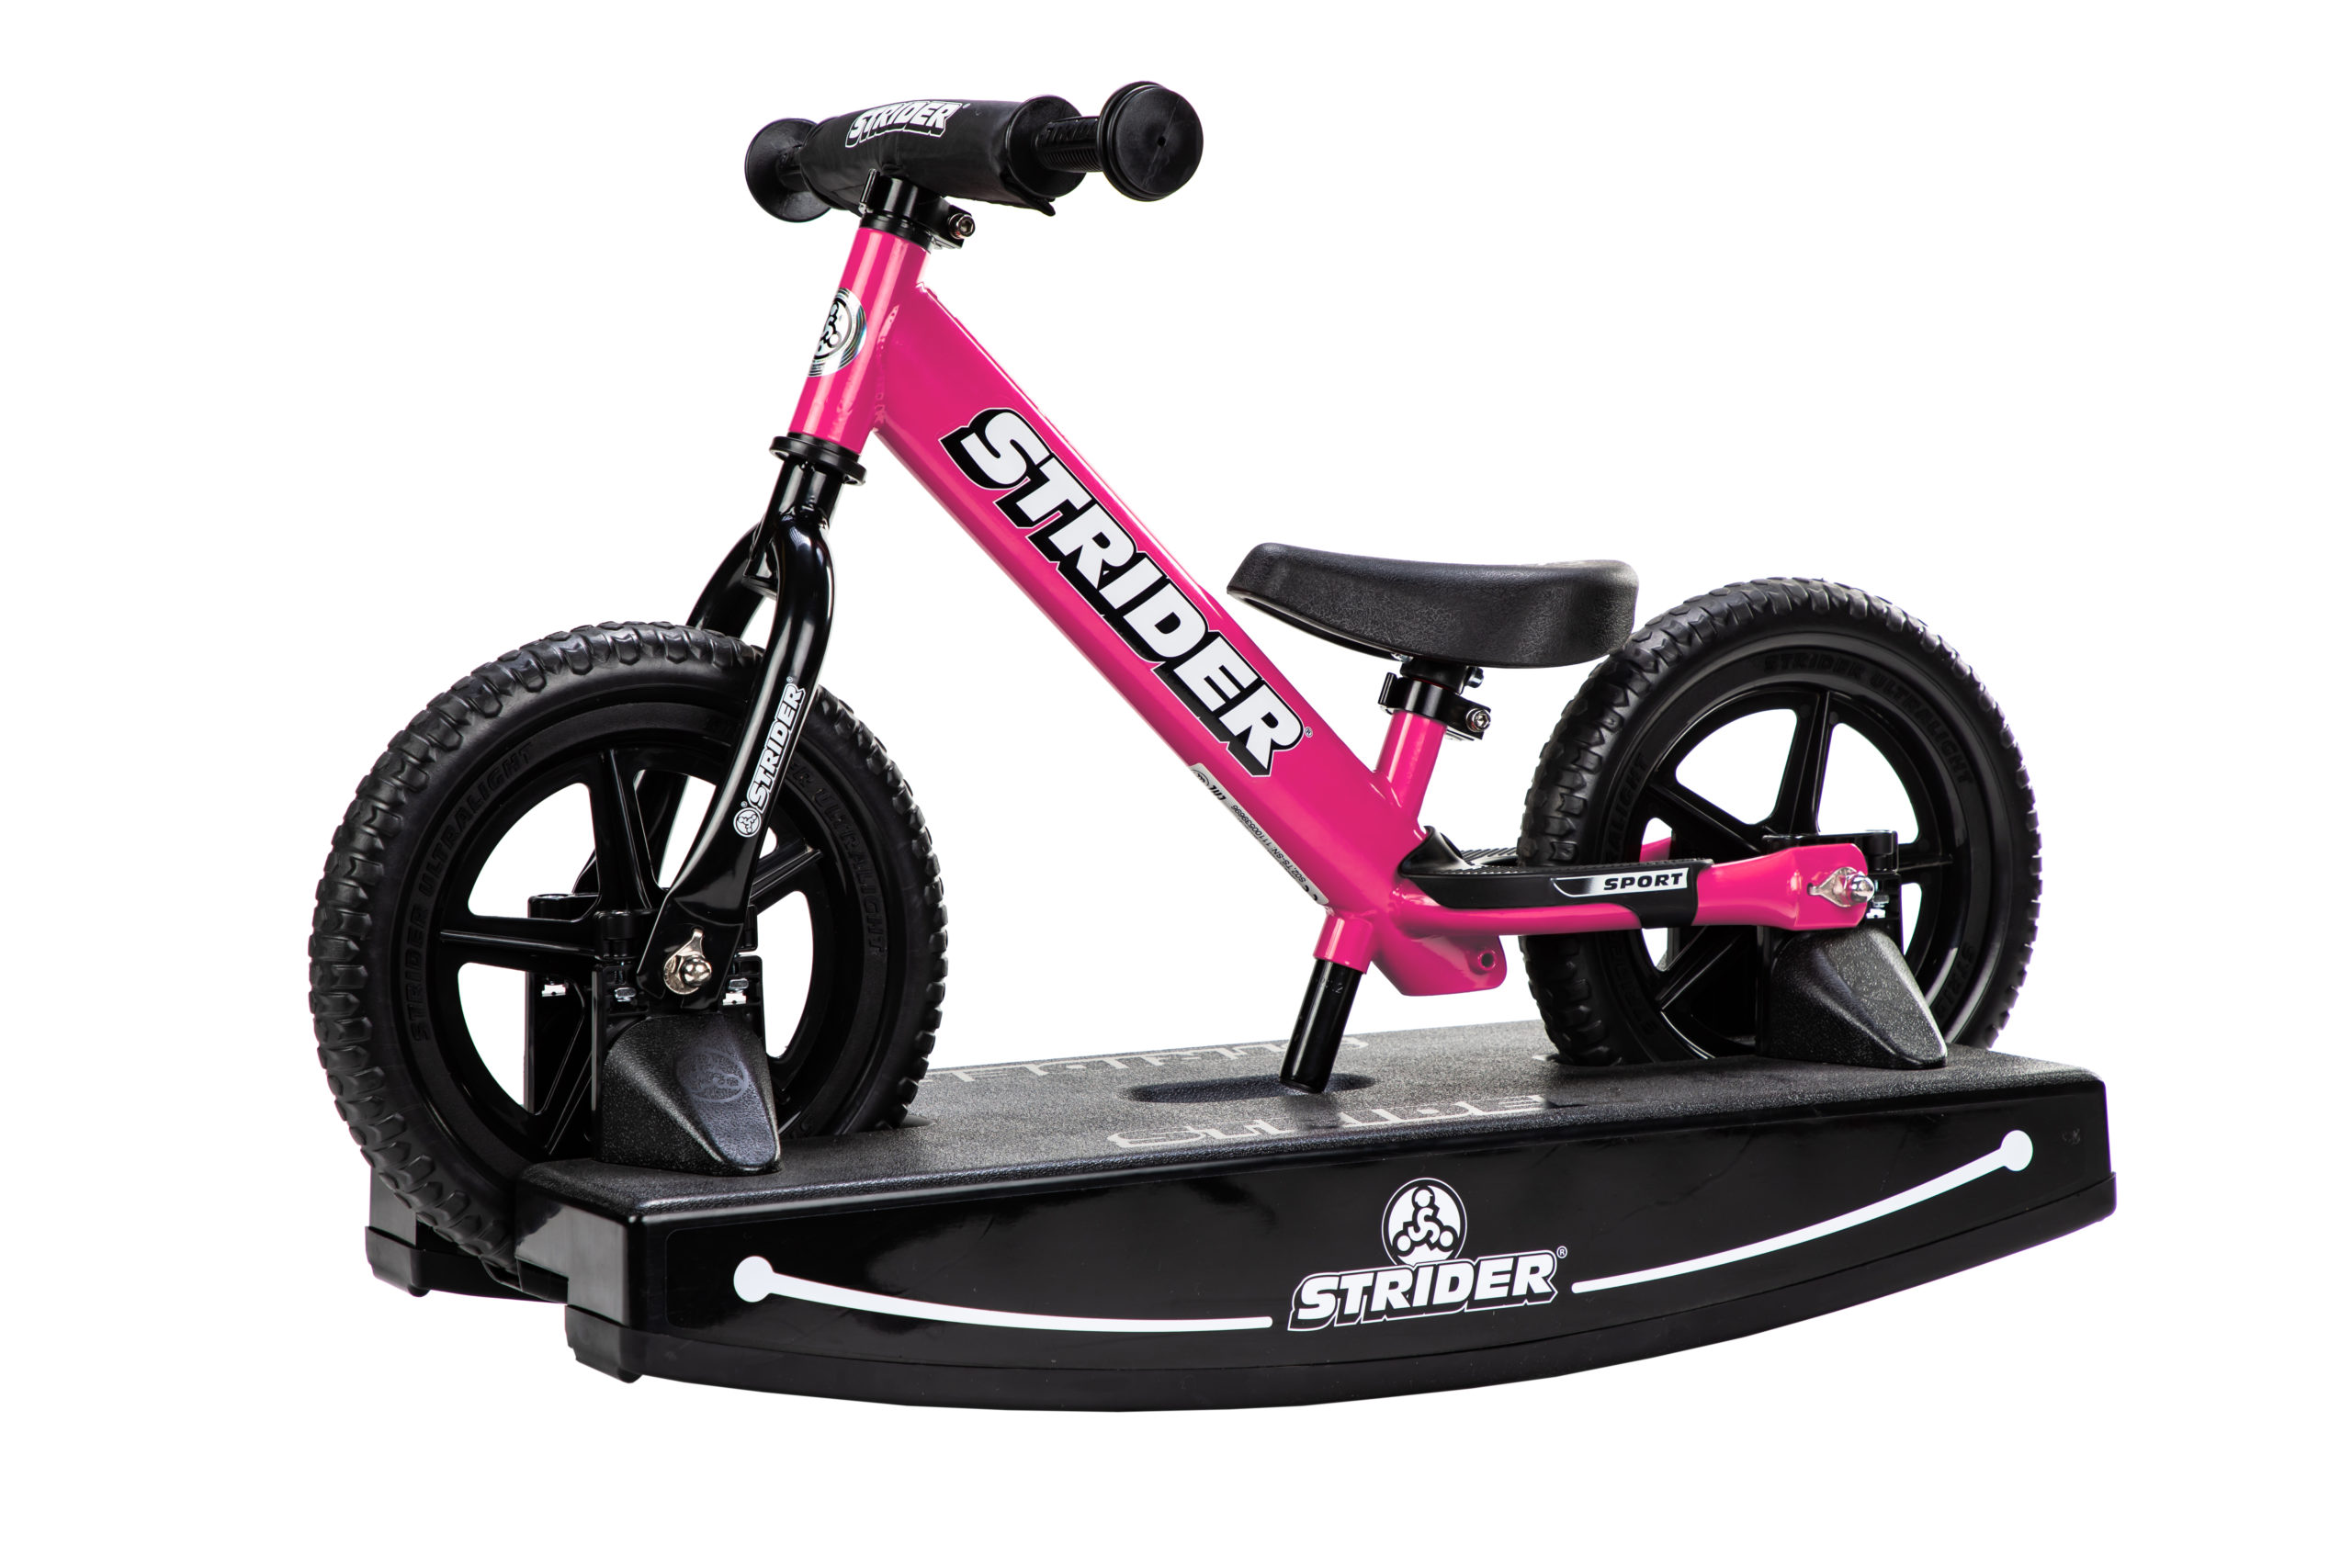 Studio Image of pink 12 Sport 2-in-1 Rocking Bike